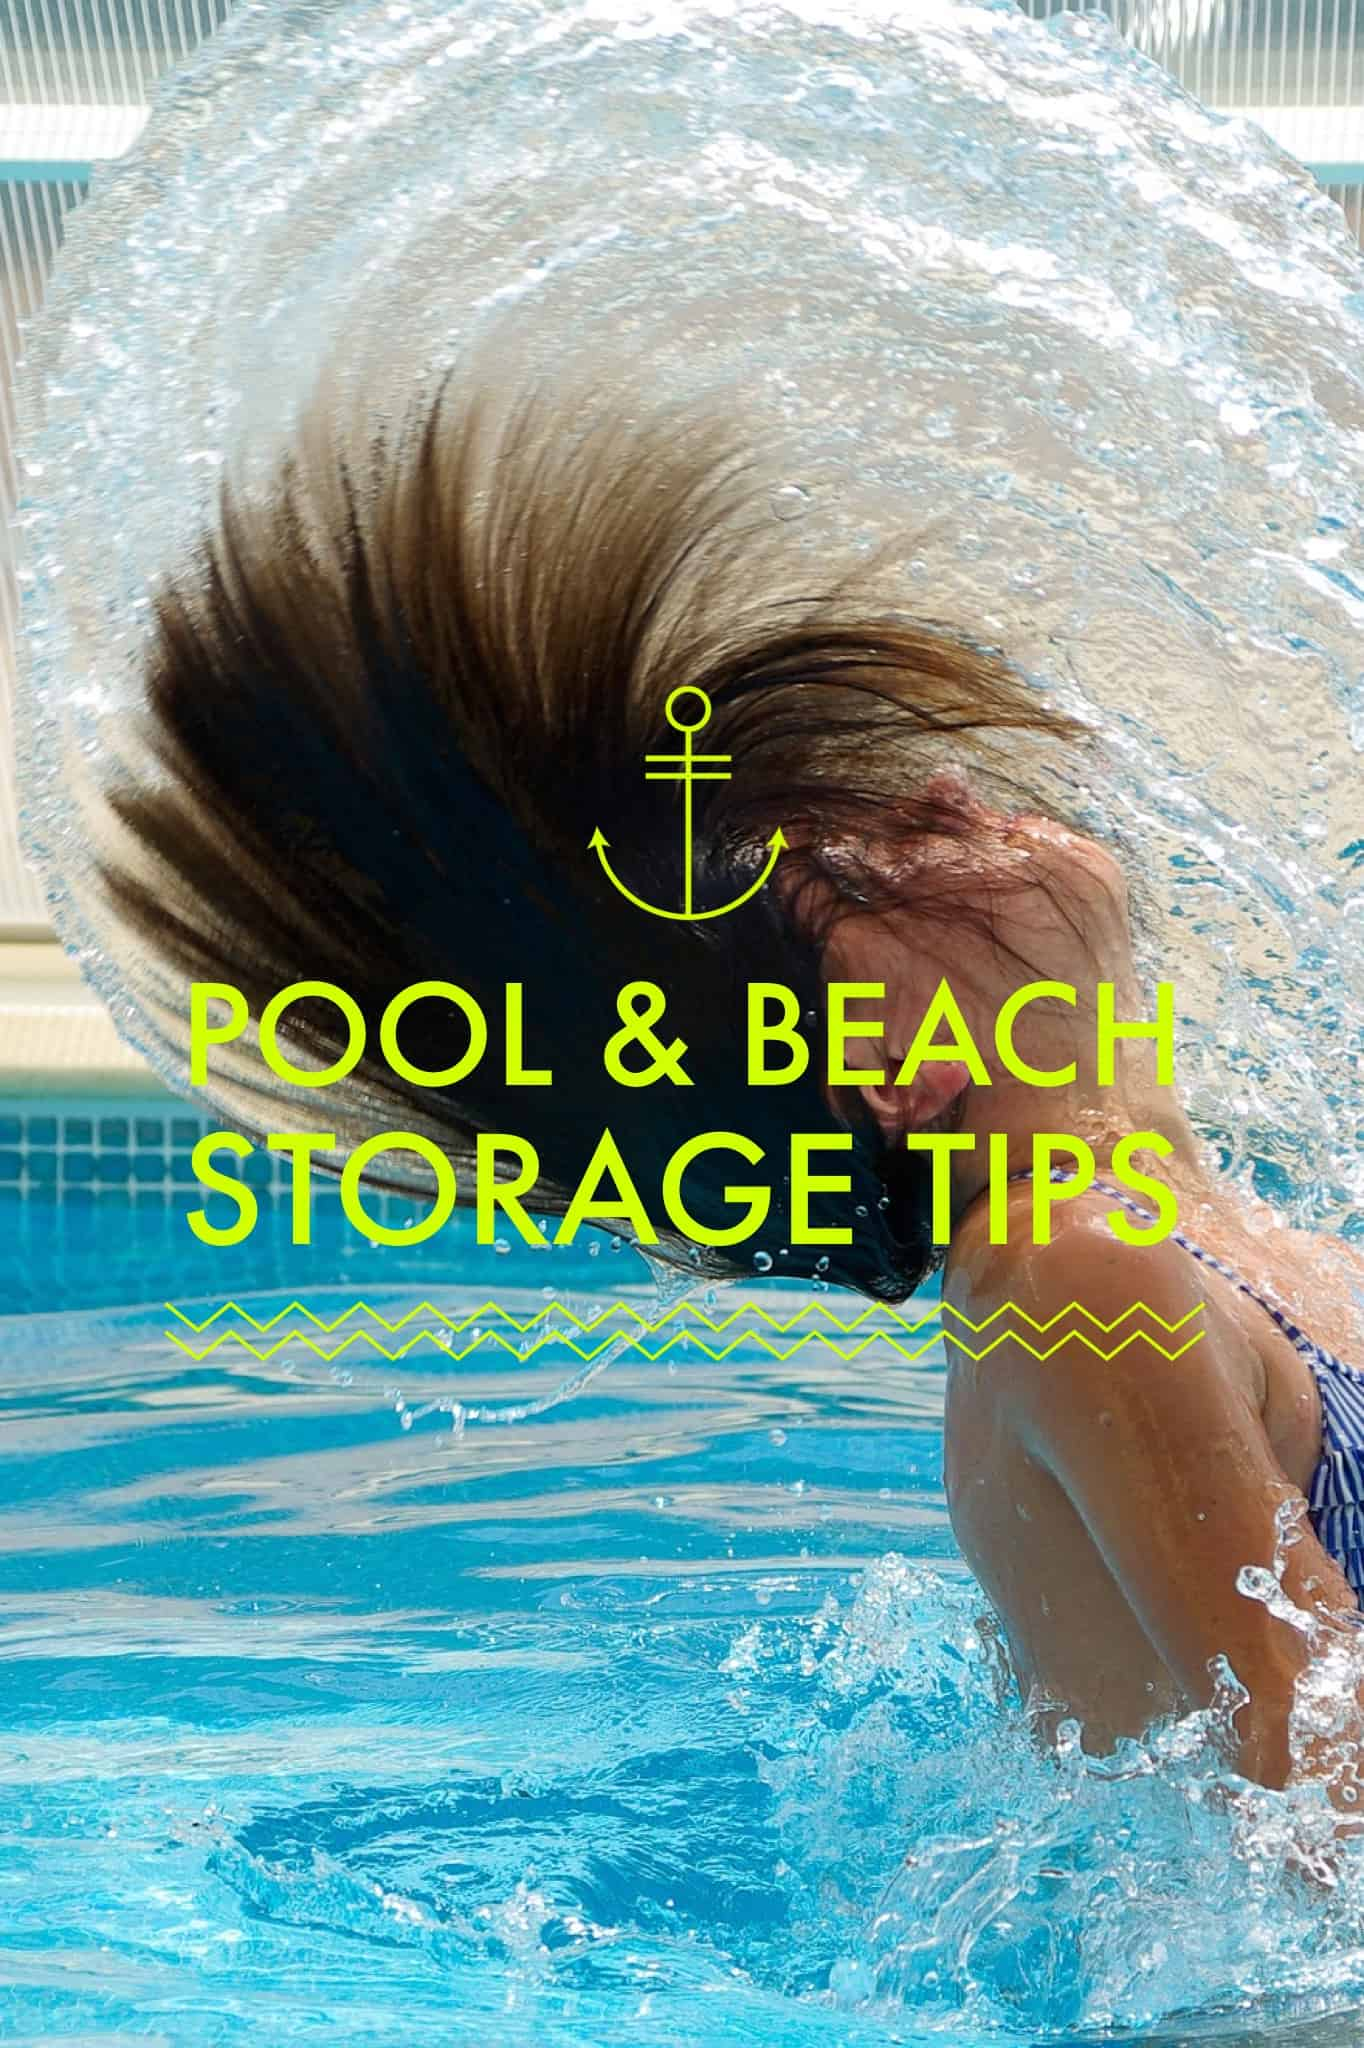 Pool & Beach Storage Tips Title